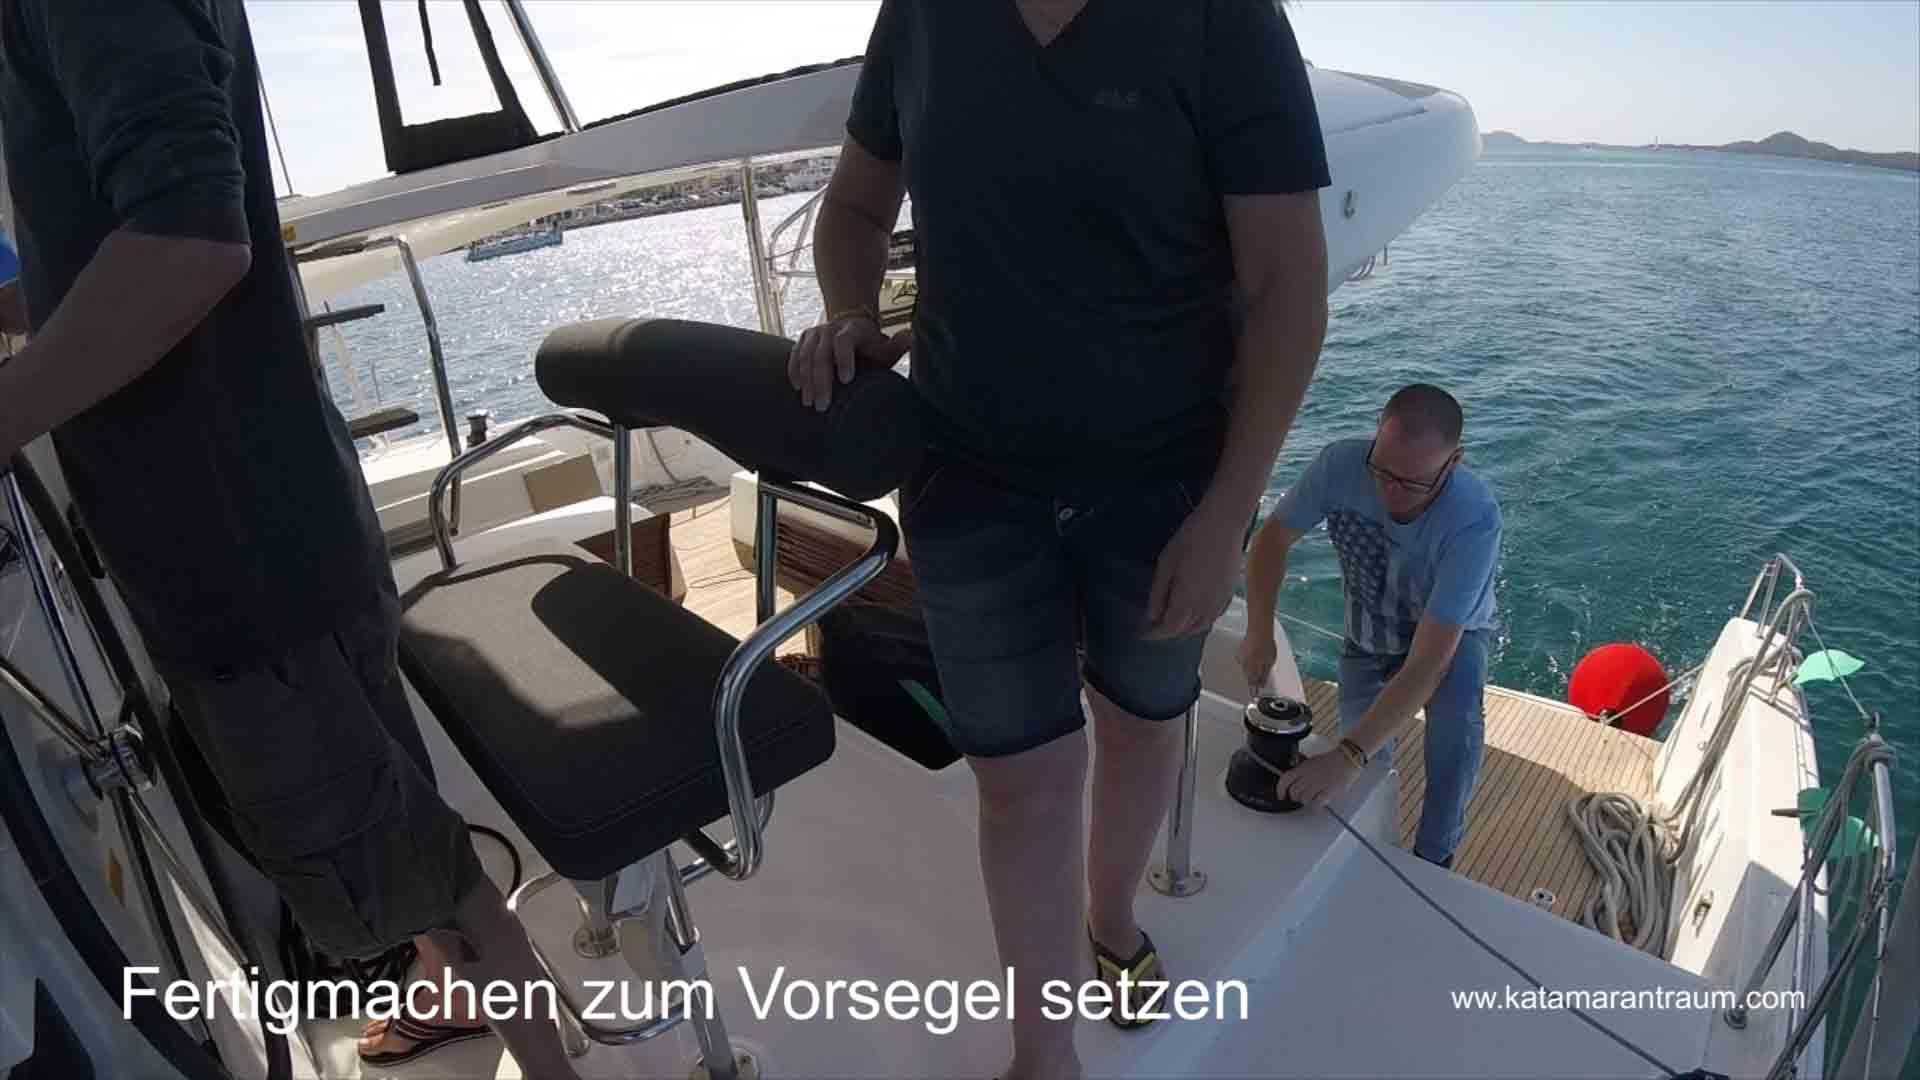 The catamaran training participants set the foresail